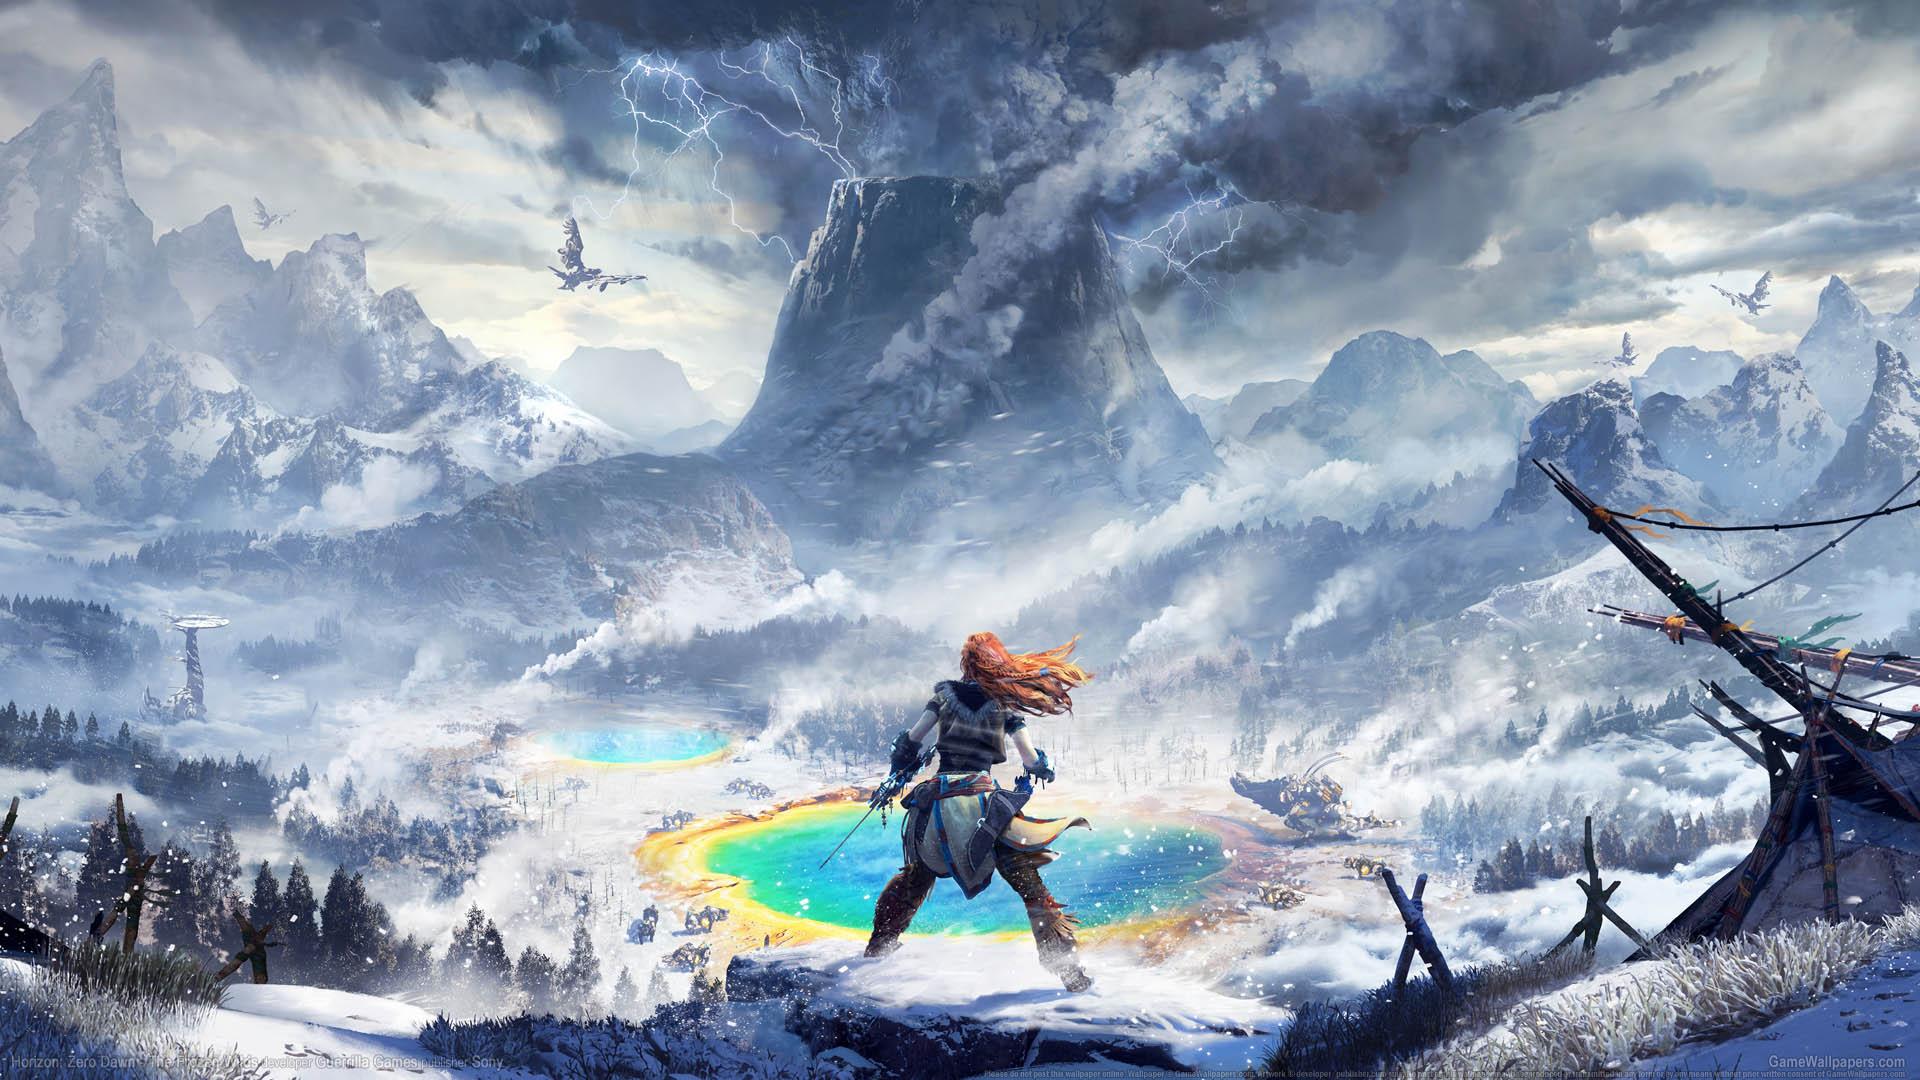 Horizon: Zero Dawn - The Frozen Wilds wallpaper 01 1920x1080